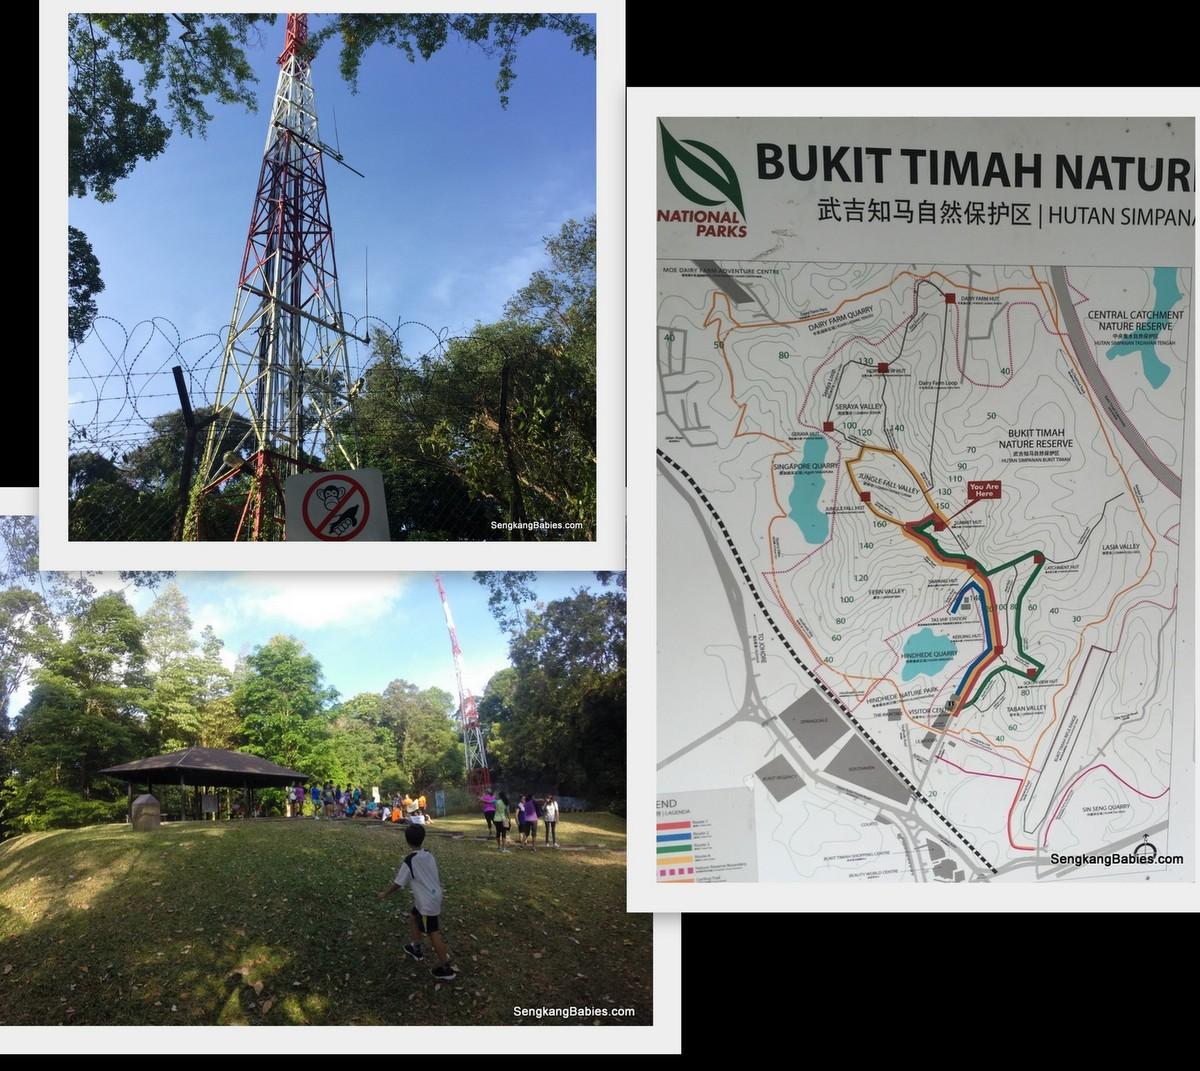 20160403 bukit timah hill exported4